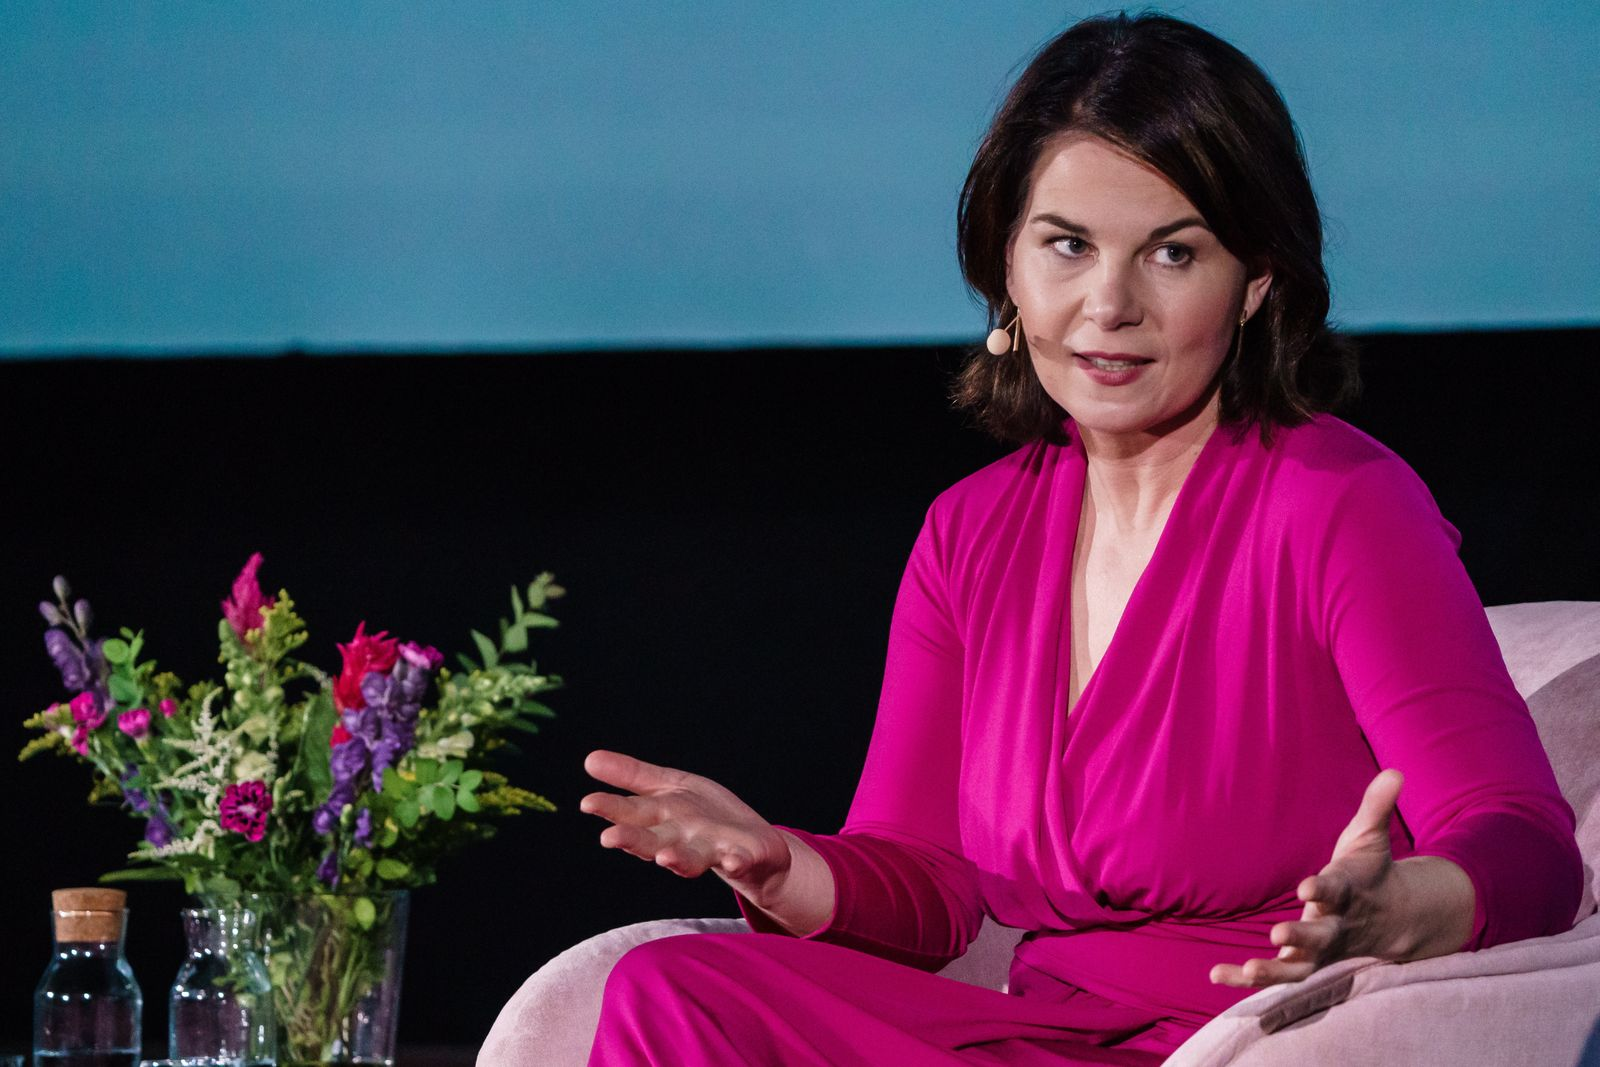 Green party federal elections top candidate Annalena Baerbock participate in Brigitte-Live talk